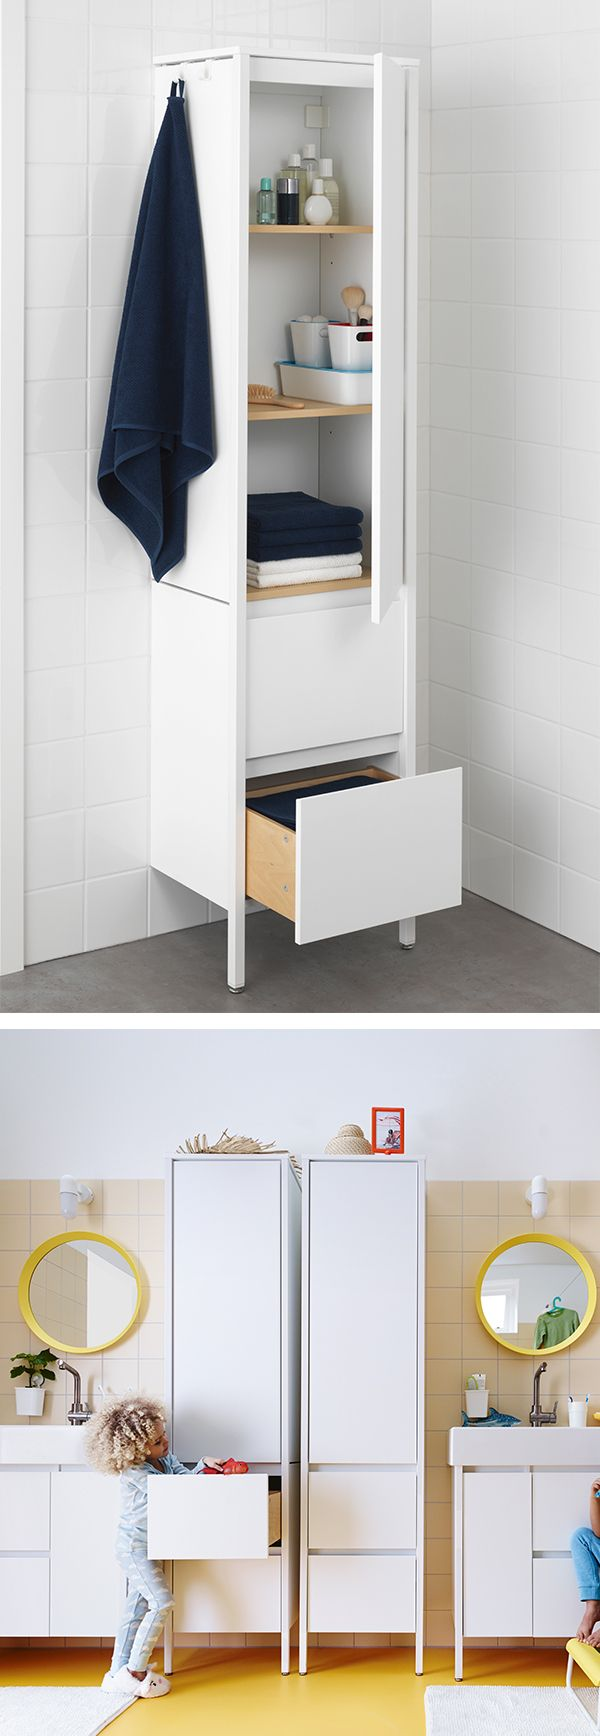 US Furniture and Home Furnishings Ikea bathroom